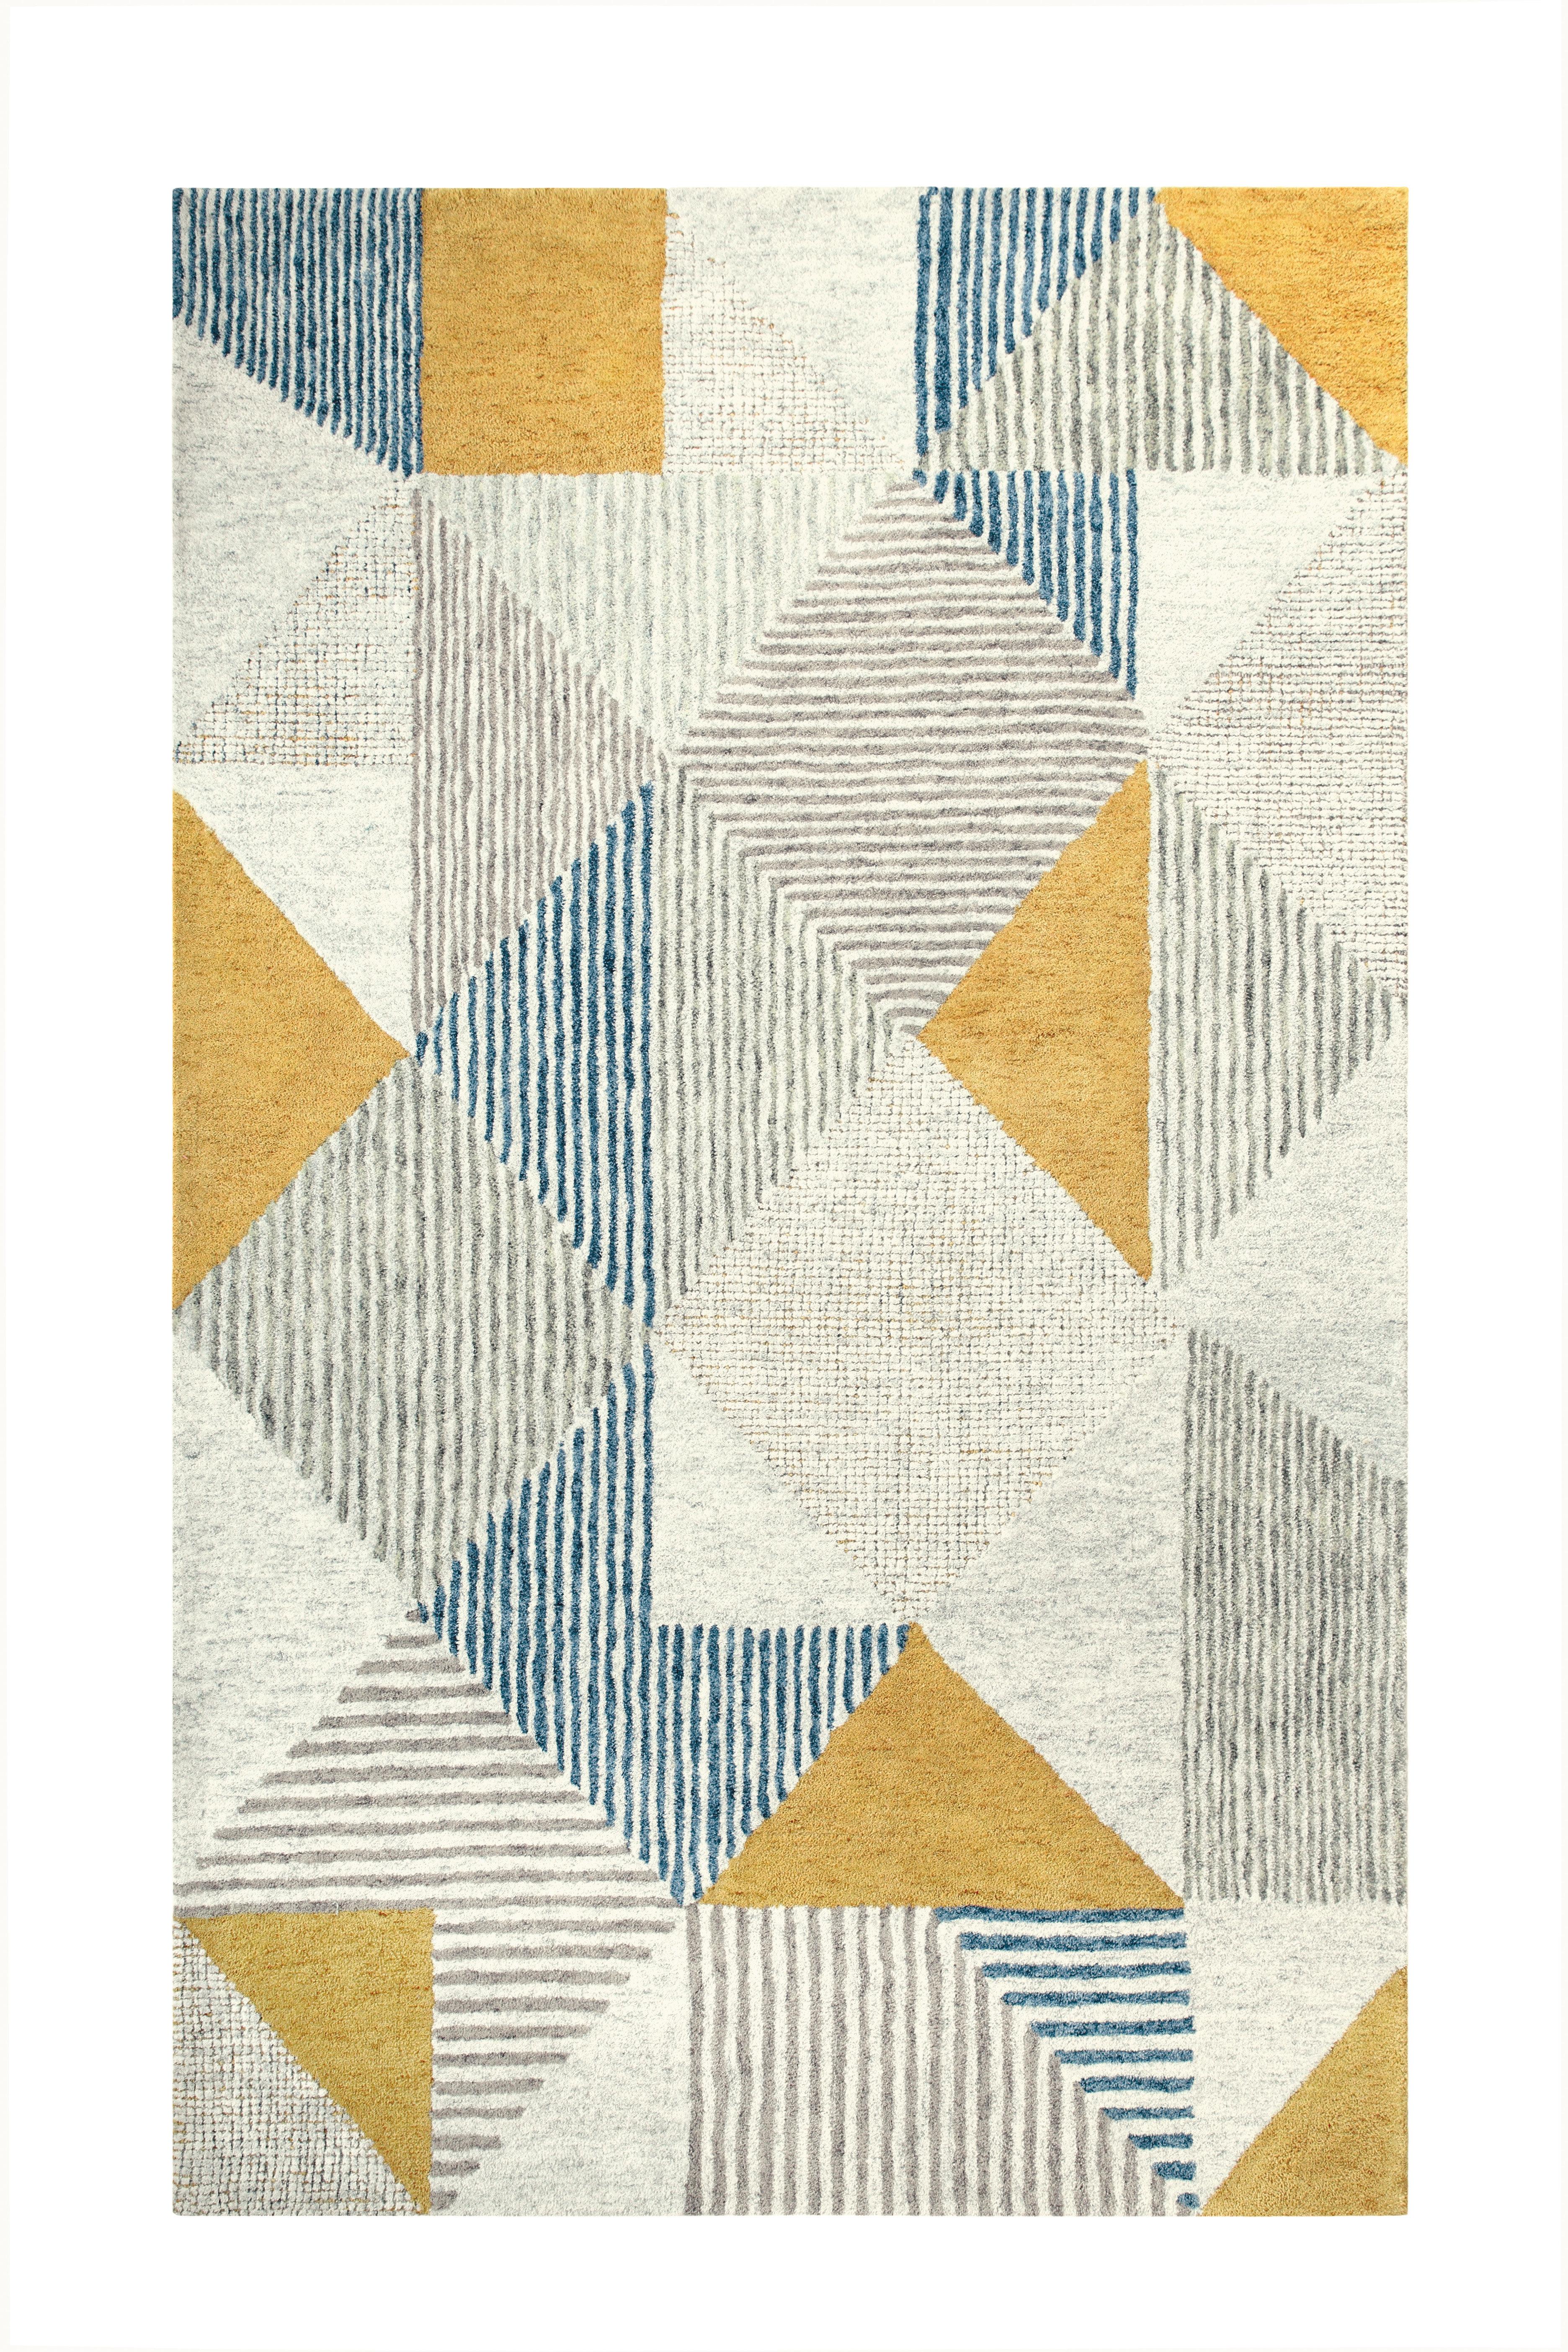 Companyc Griffin Geometric Handmade Tufted Wool Blue Gray Yellow Area Rug Wayfair